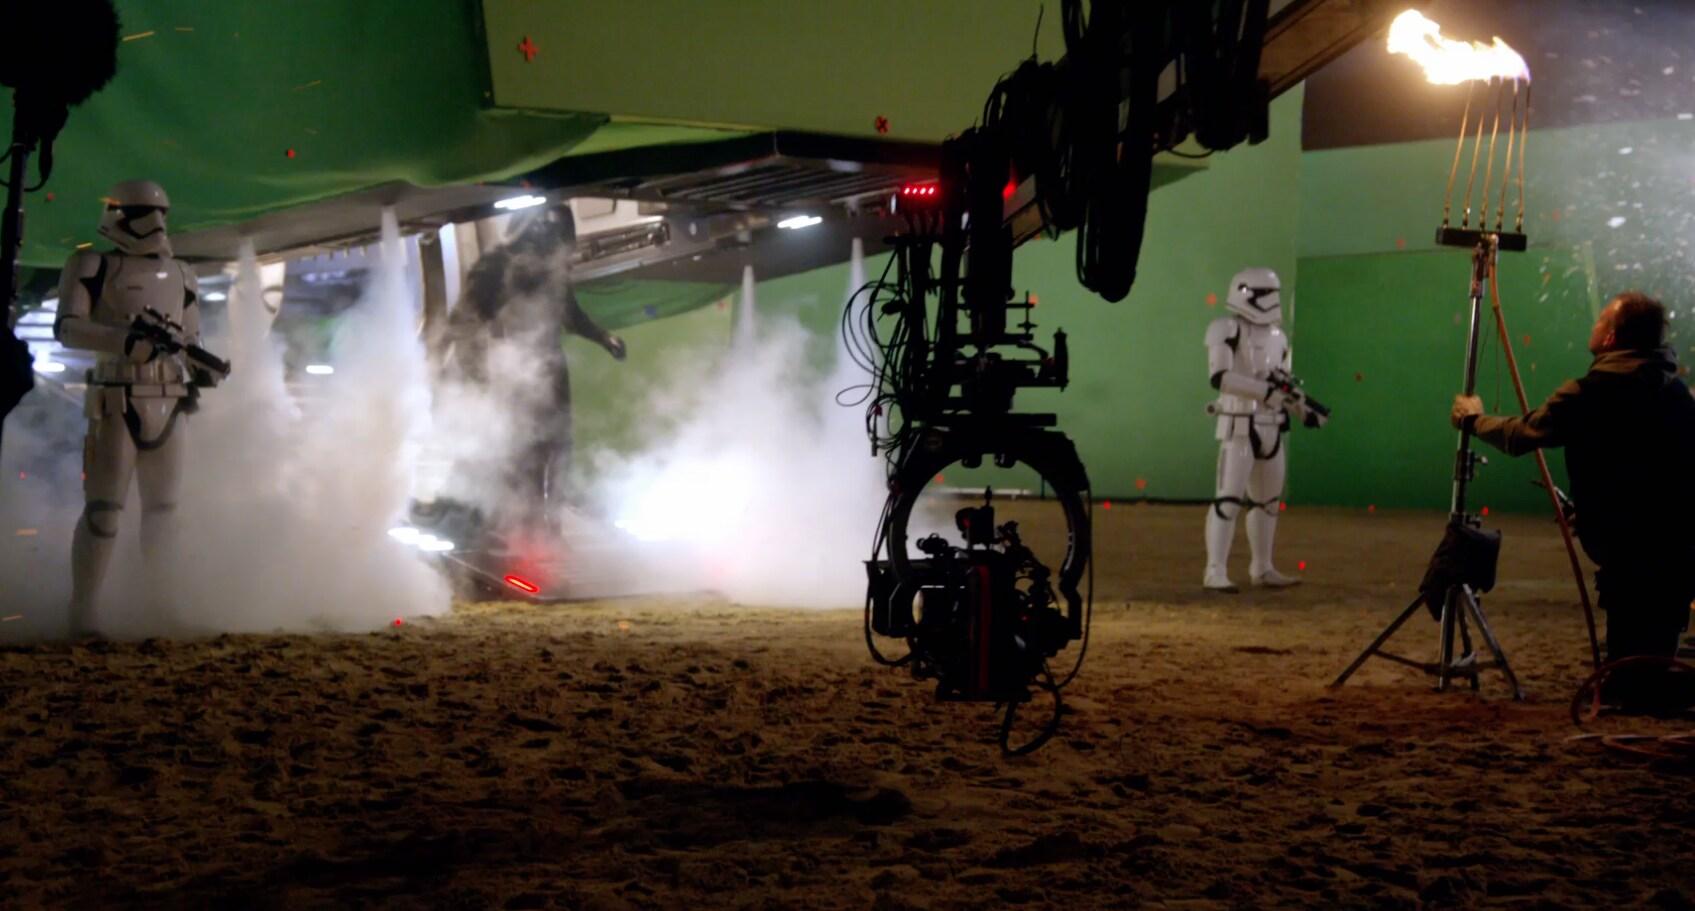 Bastidores - Star Wars: O despertar da Força